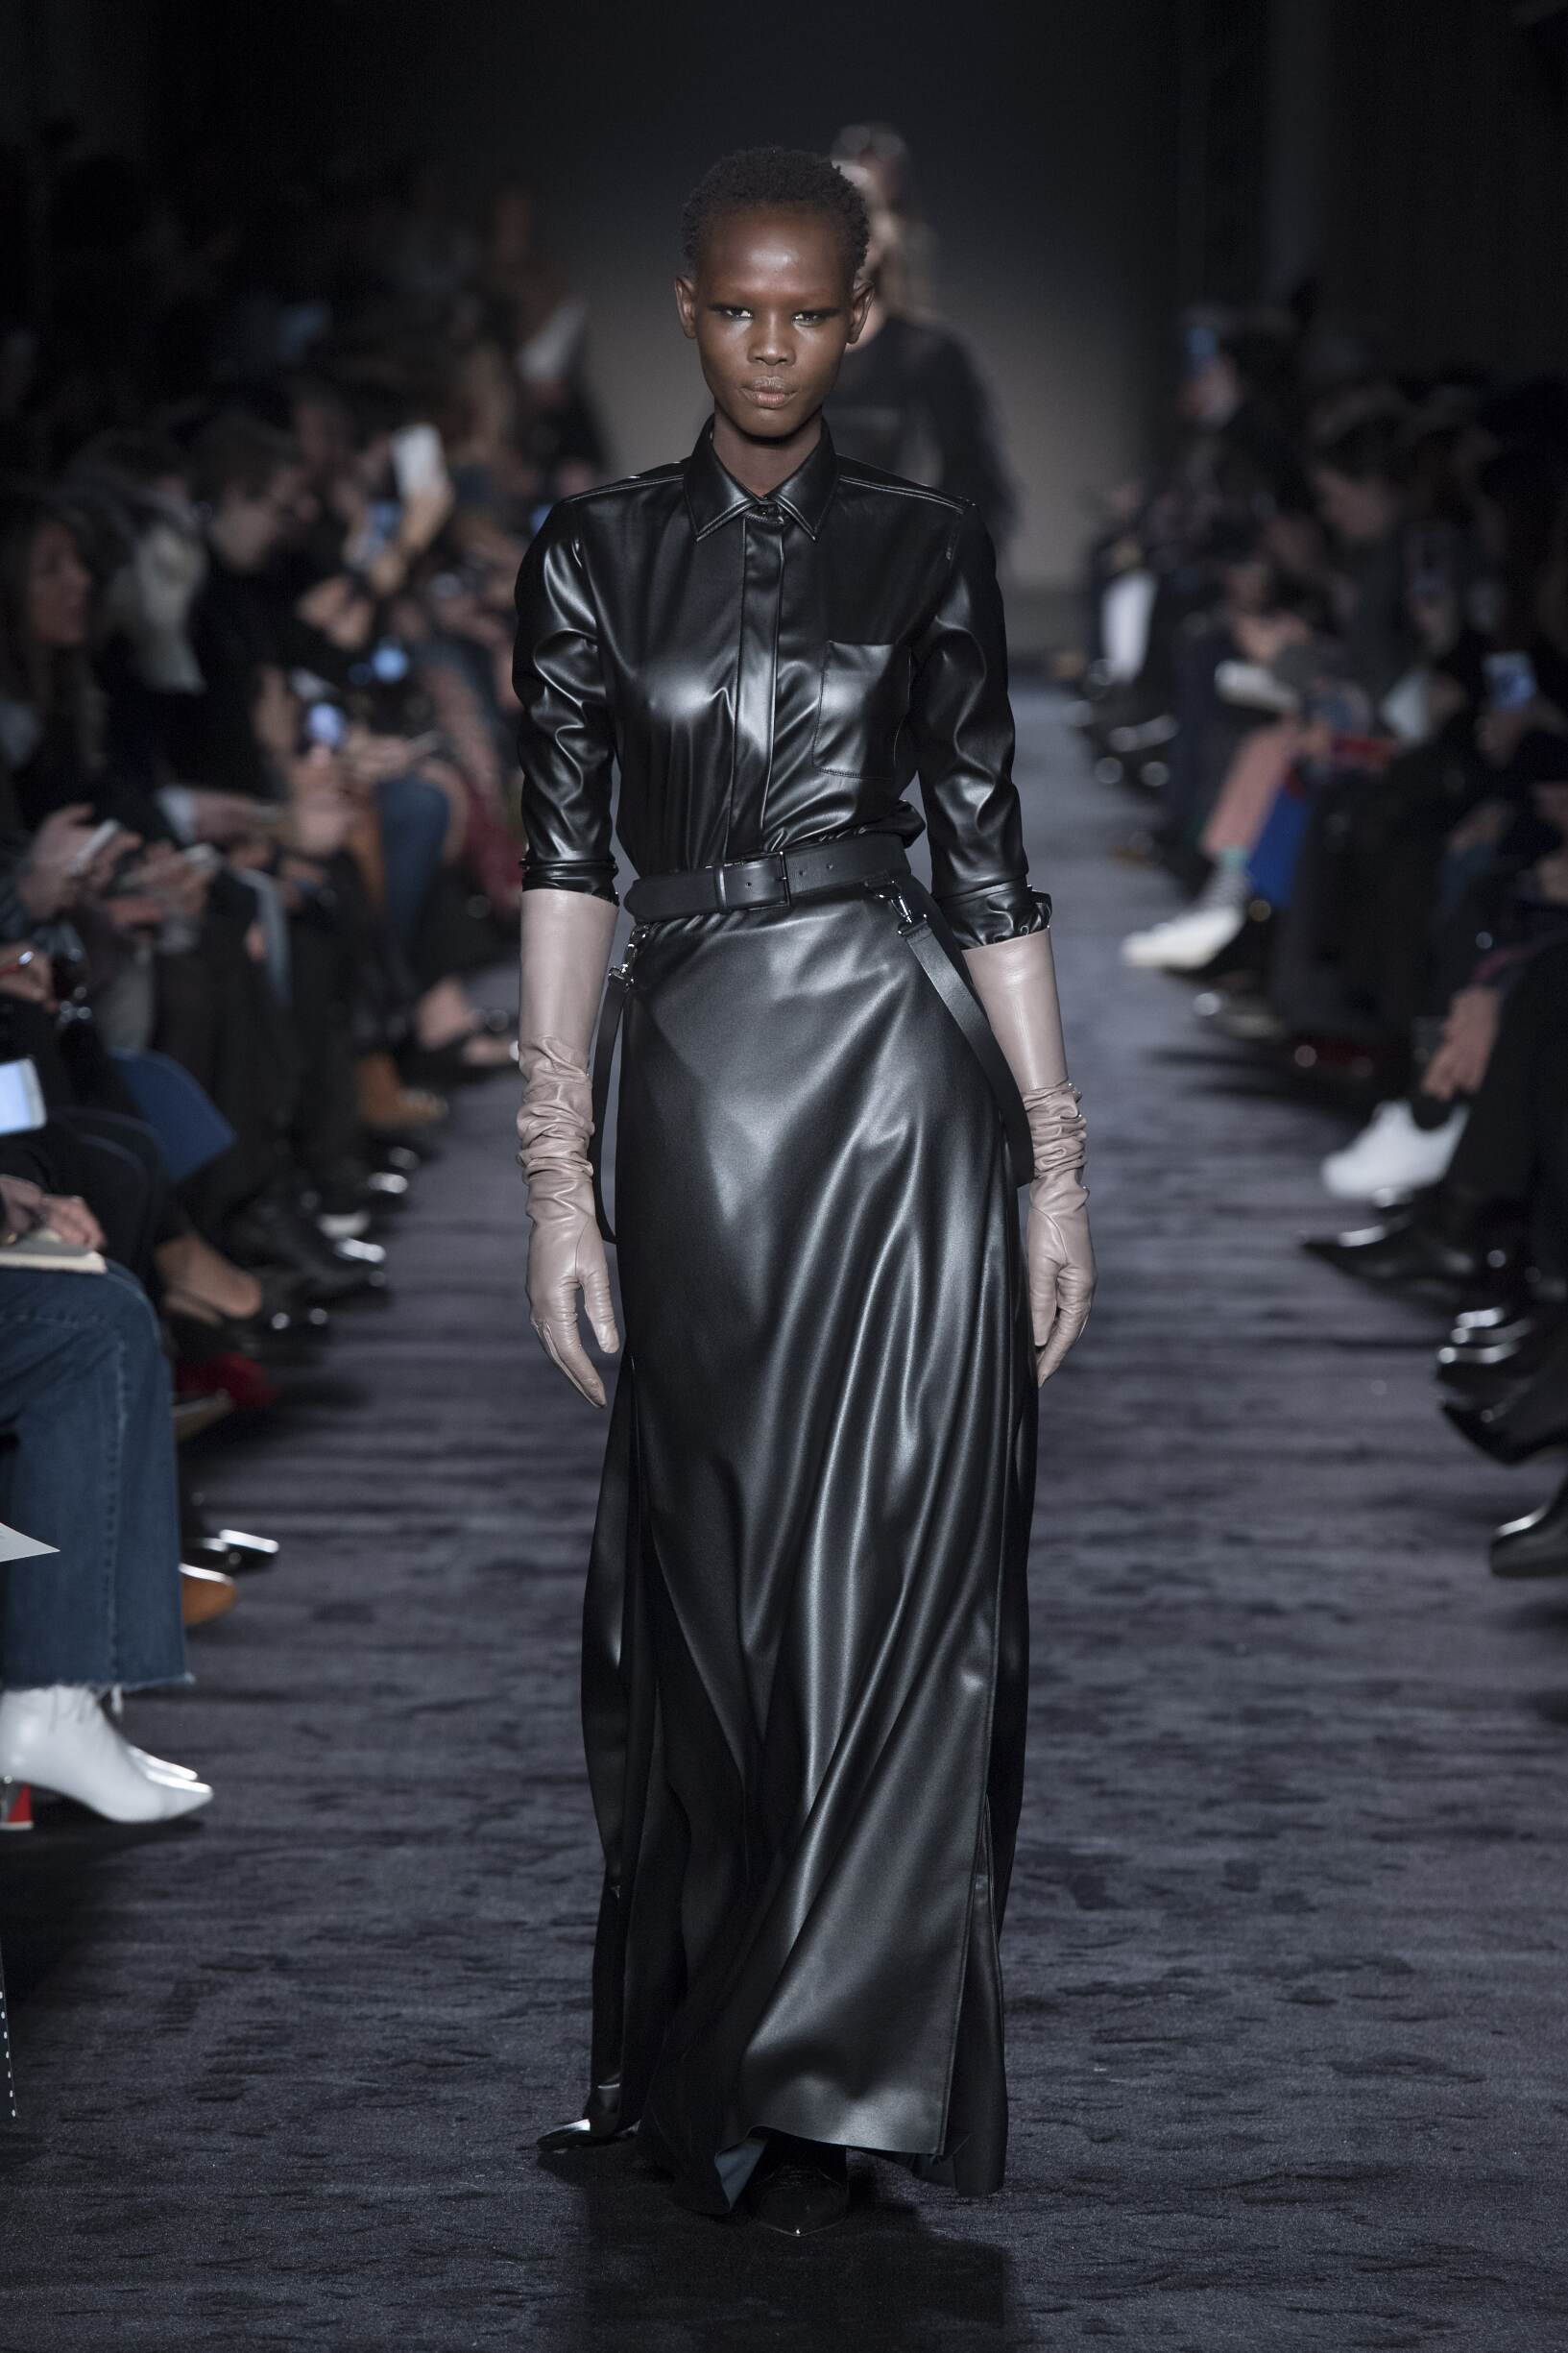 Fall 2018-19 Womenswear Max Mara